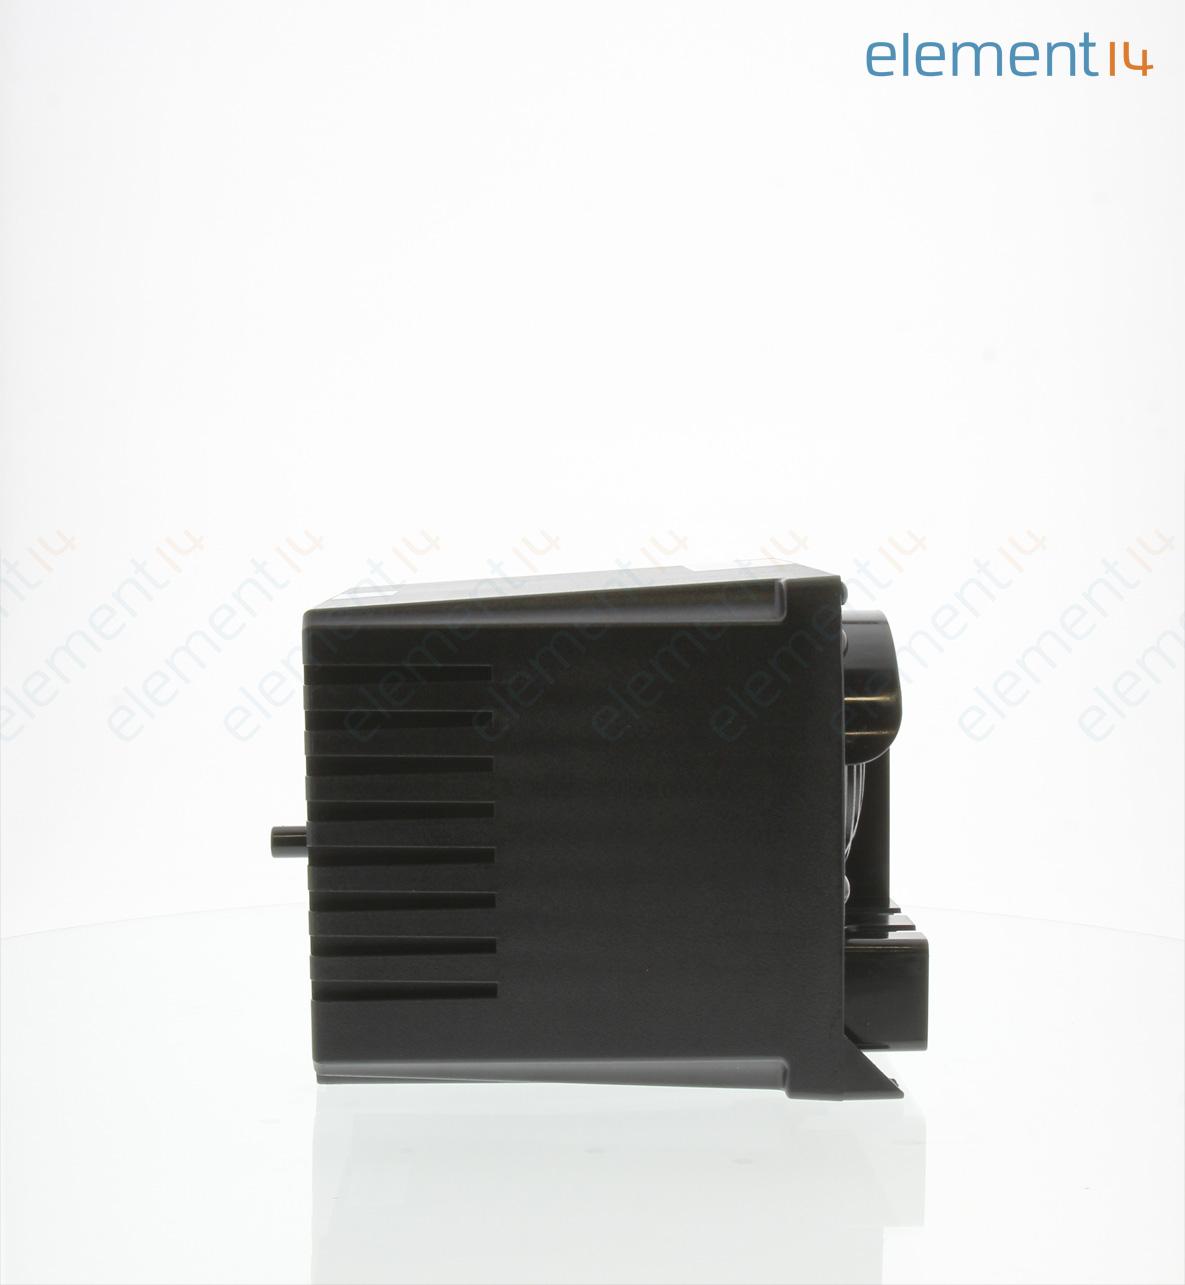 Psg960f24rm Eaton Power Supply Ac Dc 24v 65a Single Output